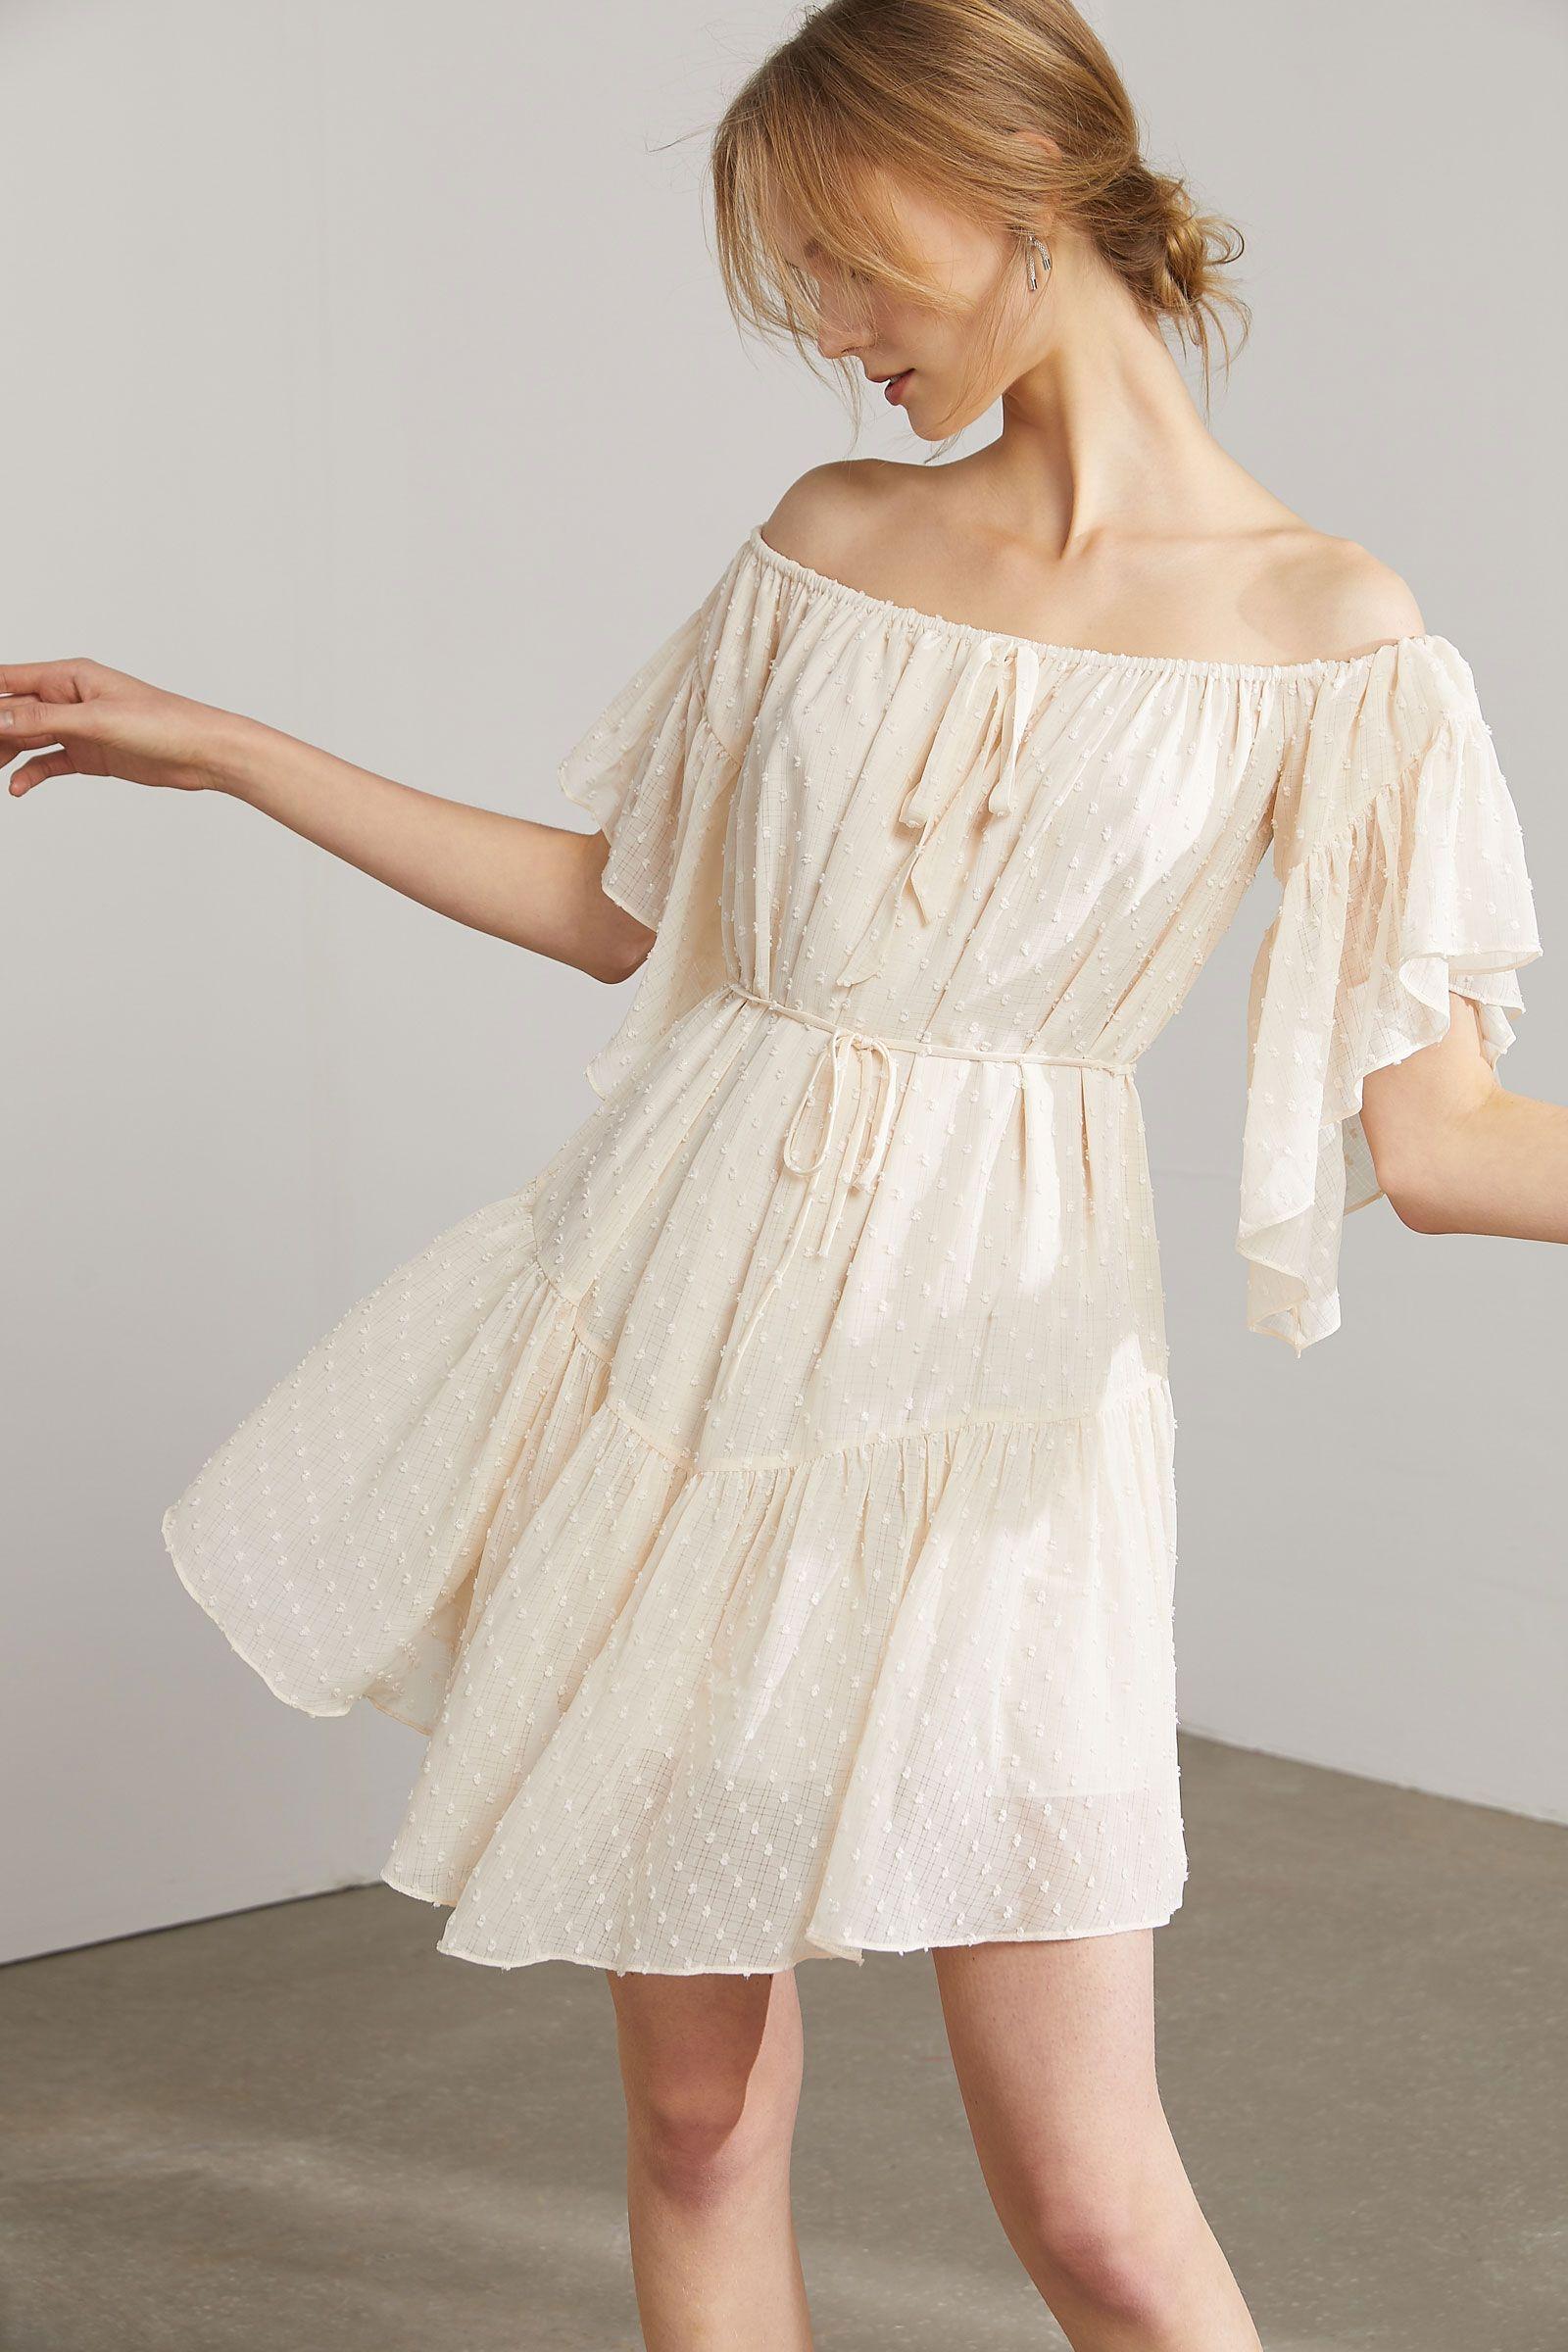 Ophelia Ivory Flutter Sleeve Dress Flutter Sleeve Dress Dresses With Sleeves Mini Dress [ 2400 x 1600 Pixel ]